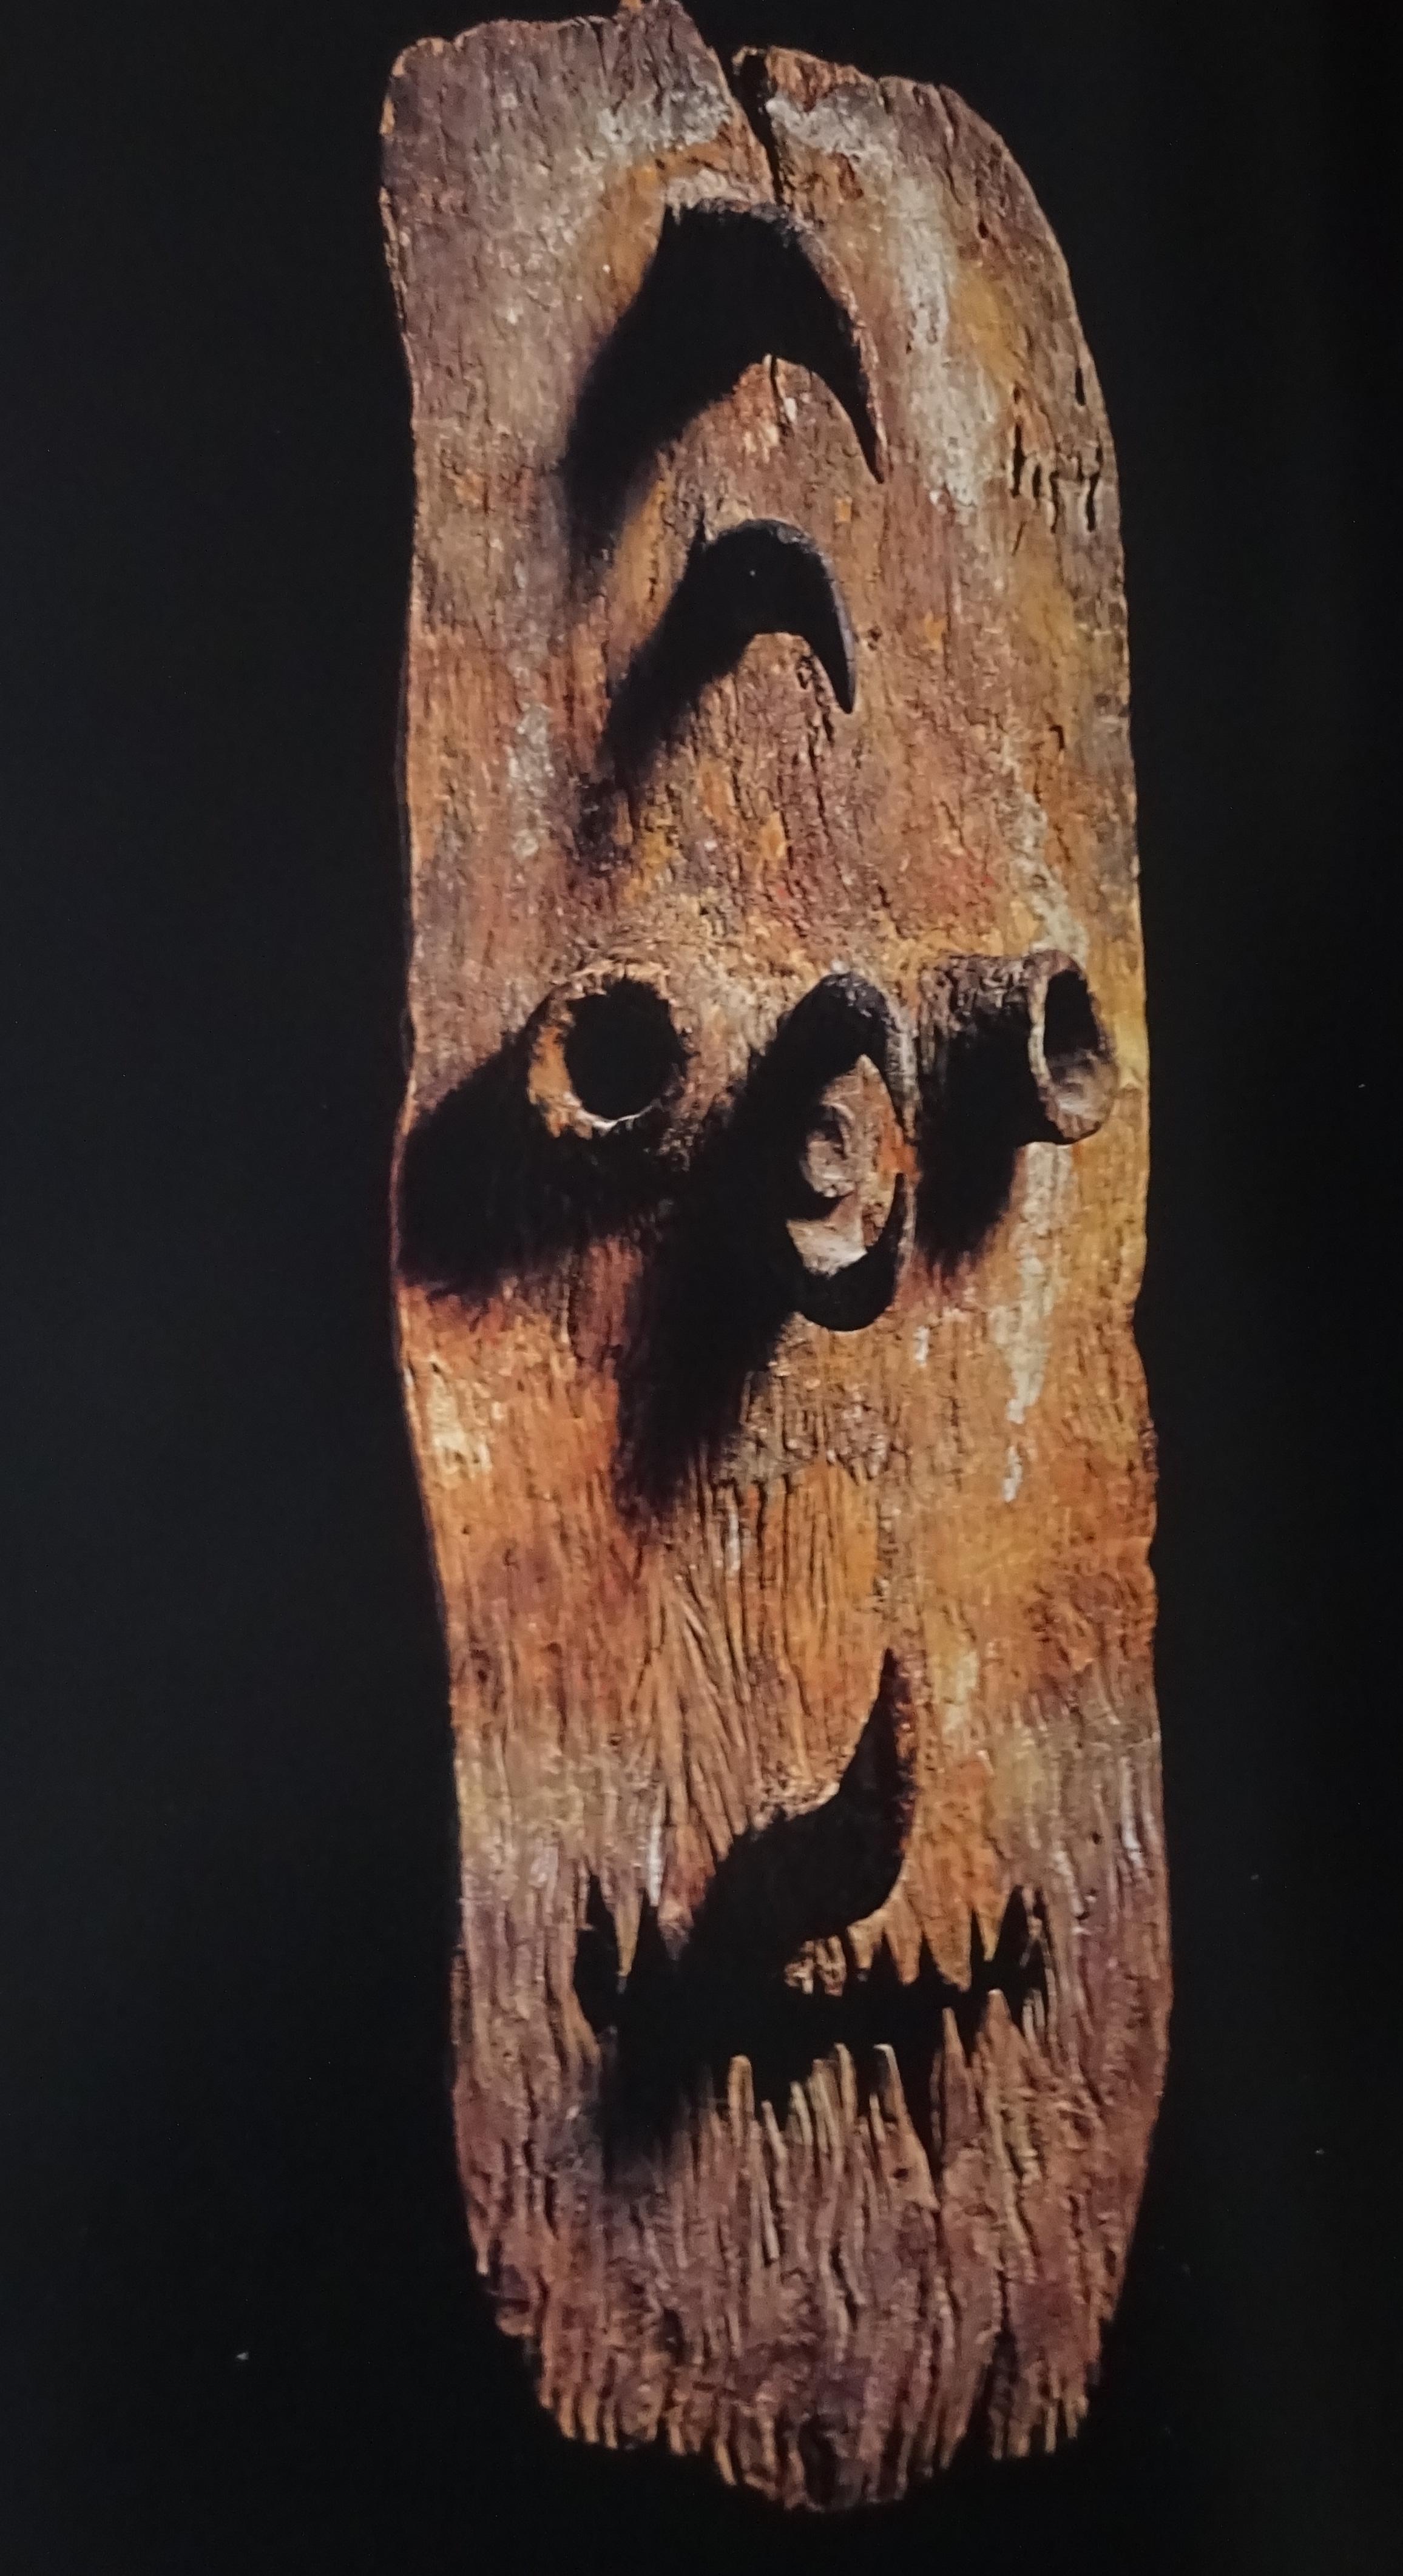 21 5445-286 blur ruin mask.jpg